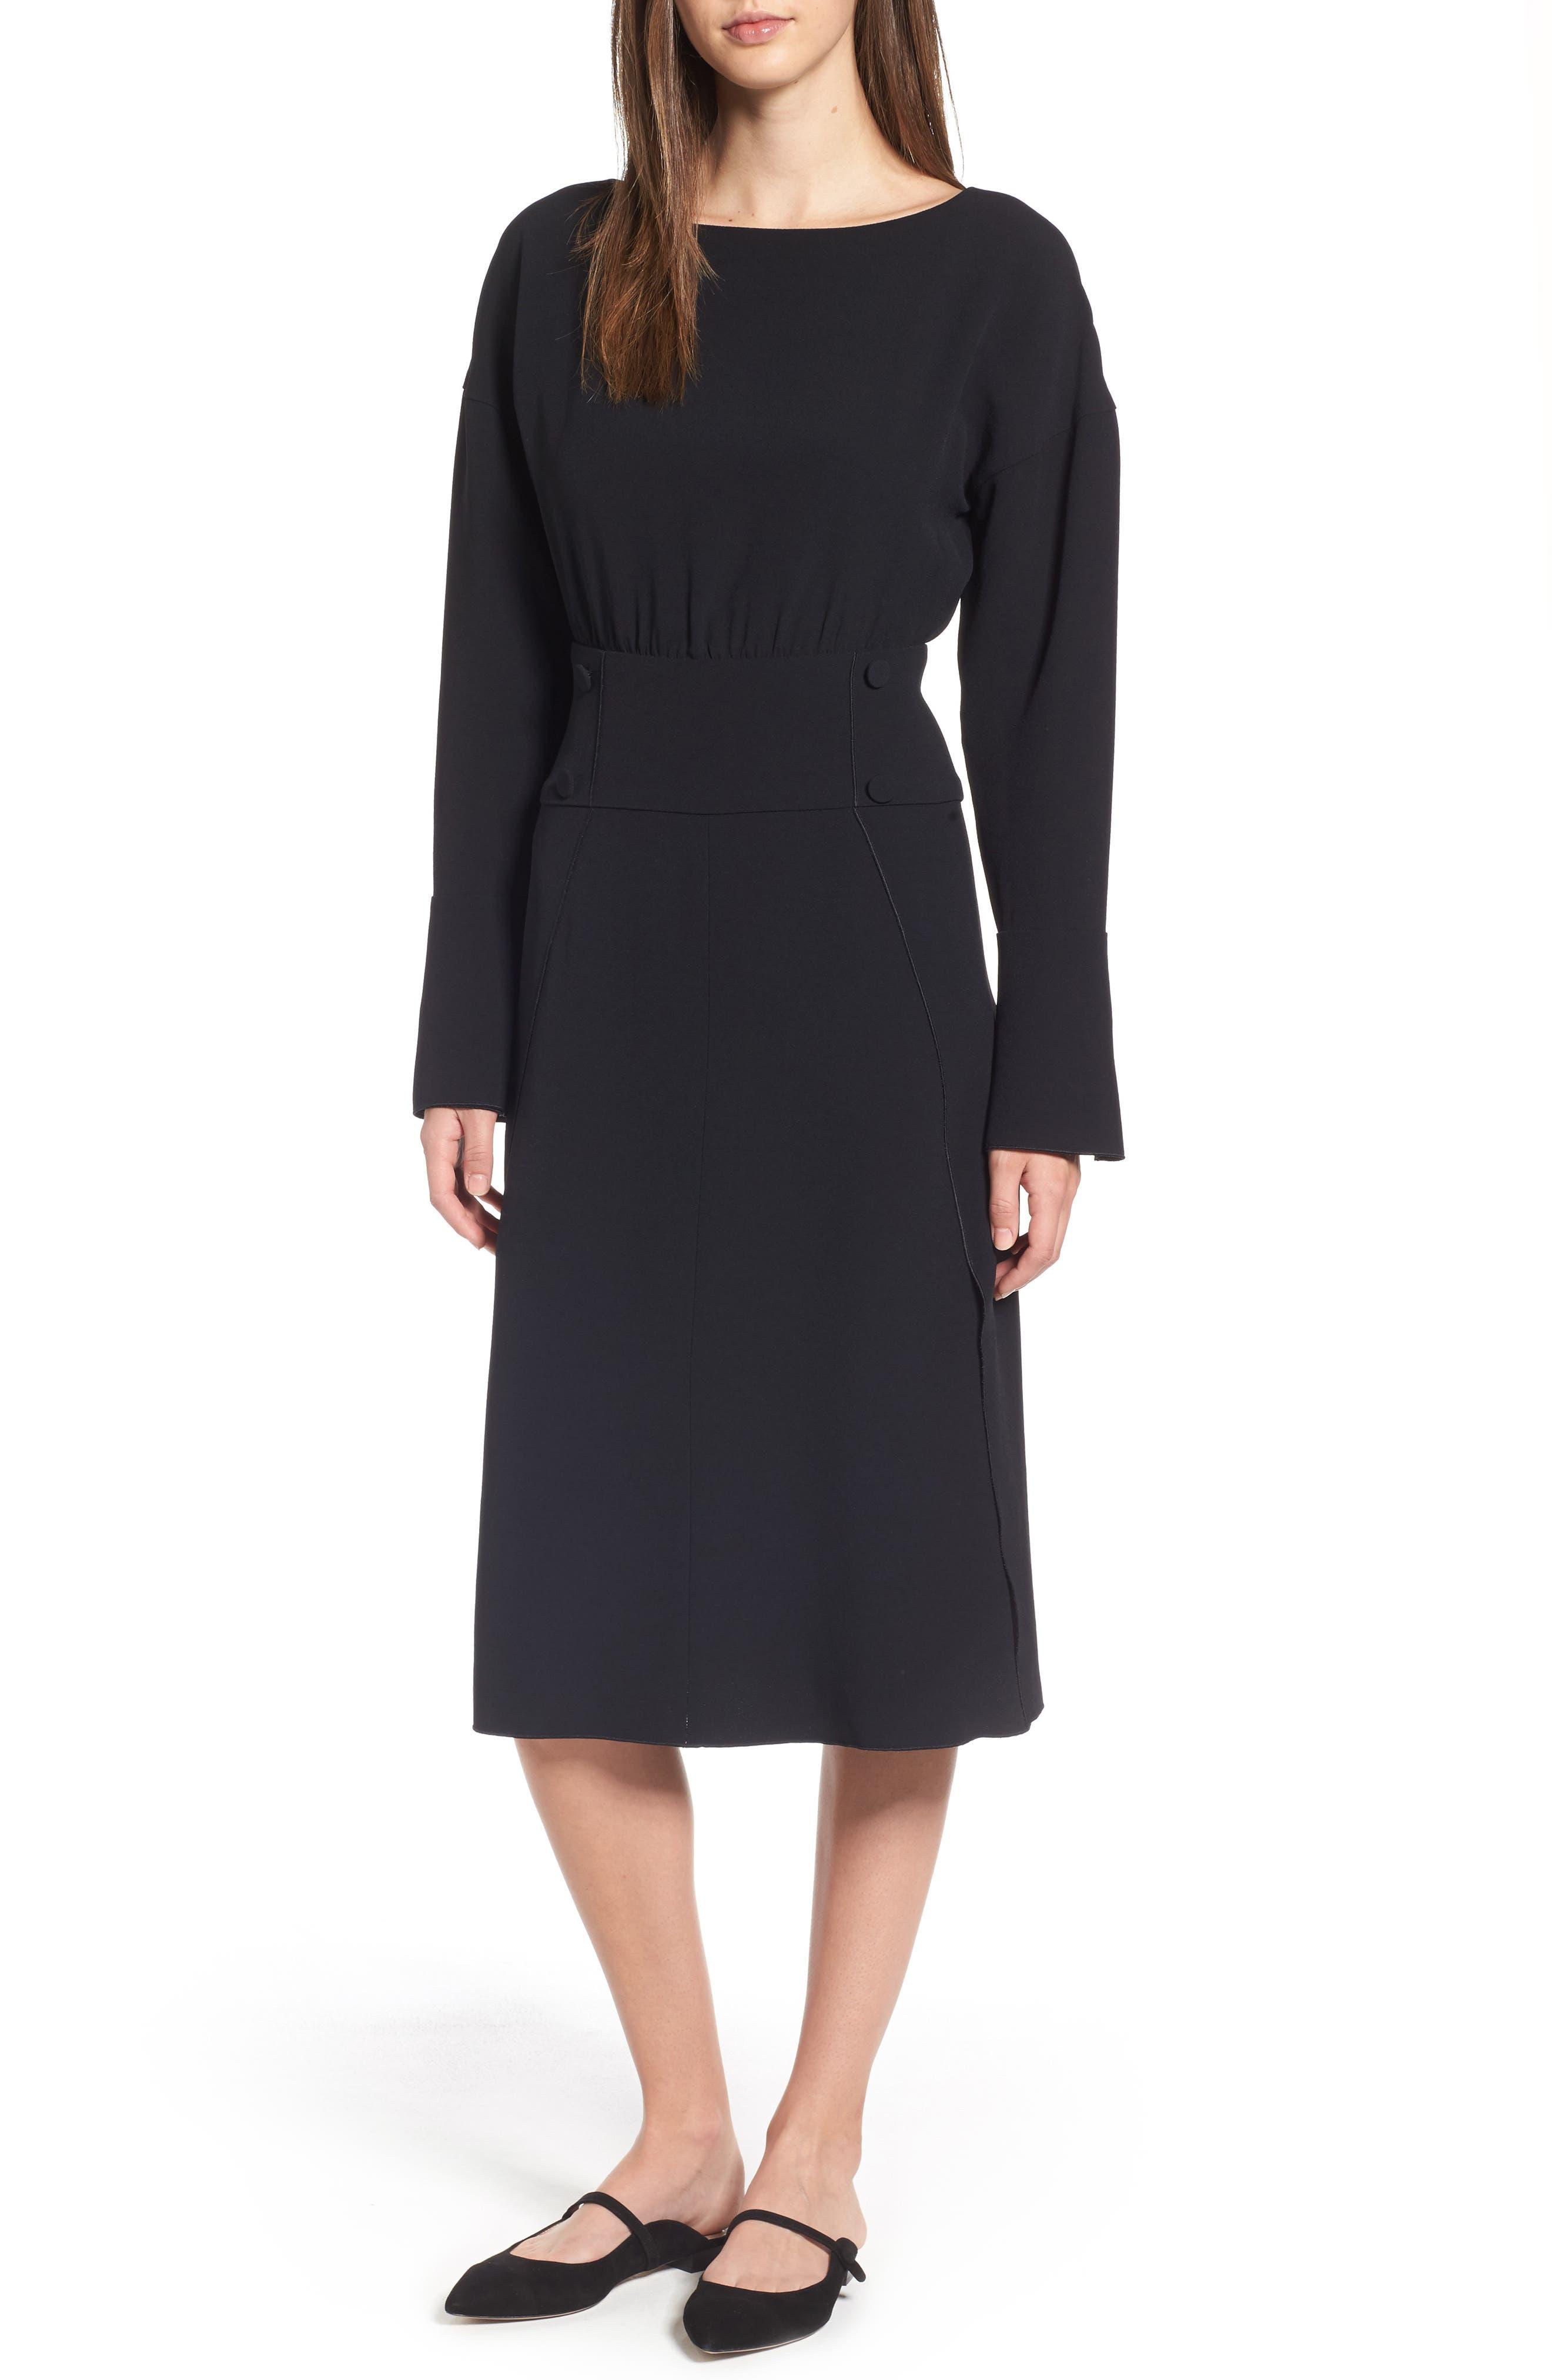 Alternate Image 1 Selected - Lewit Button Detail Matte Crepe Midi Dress